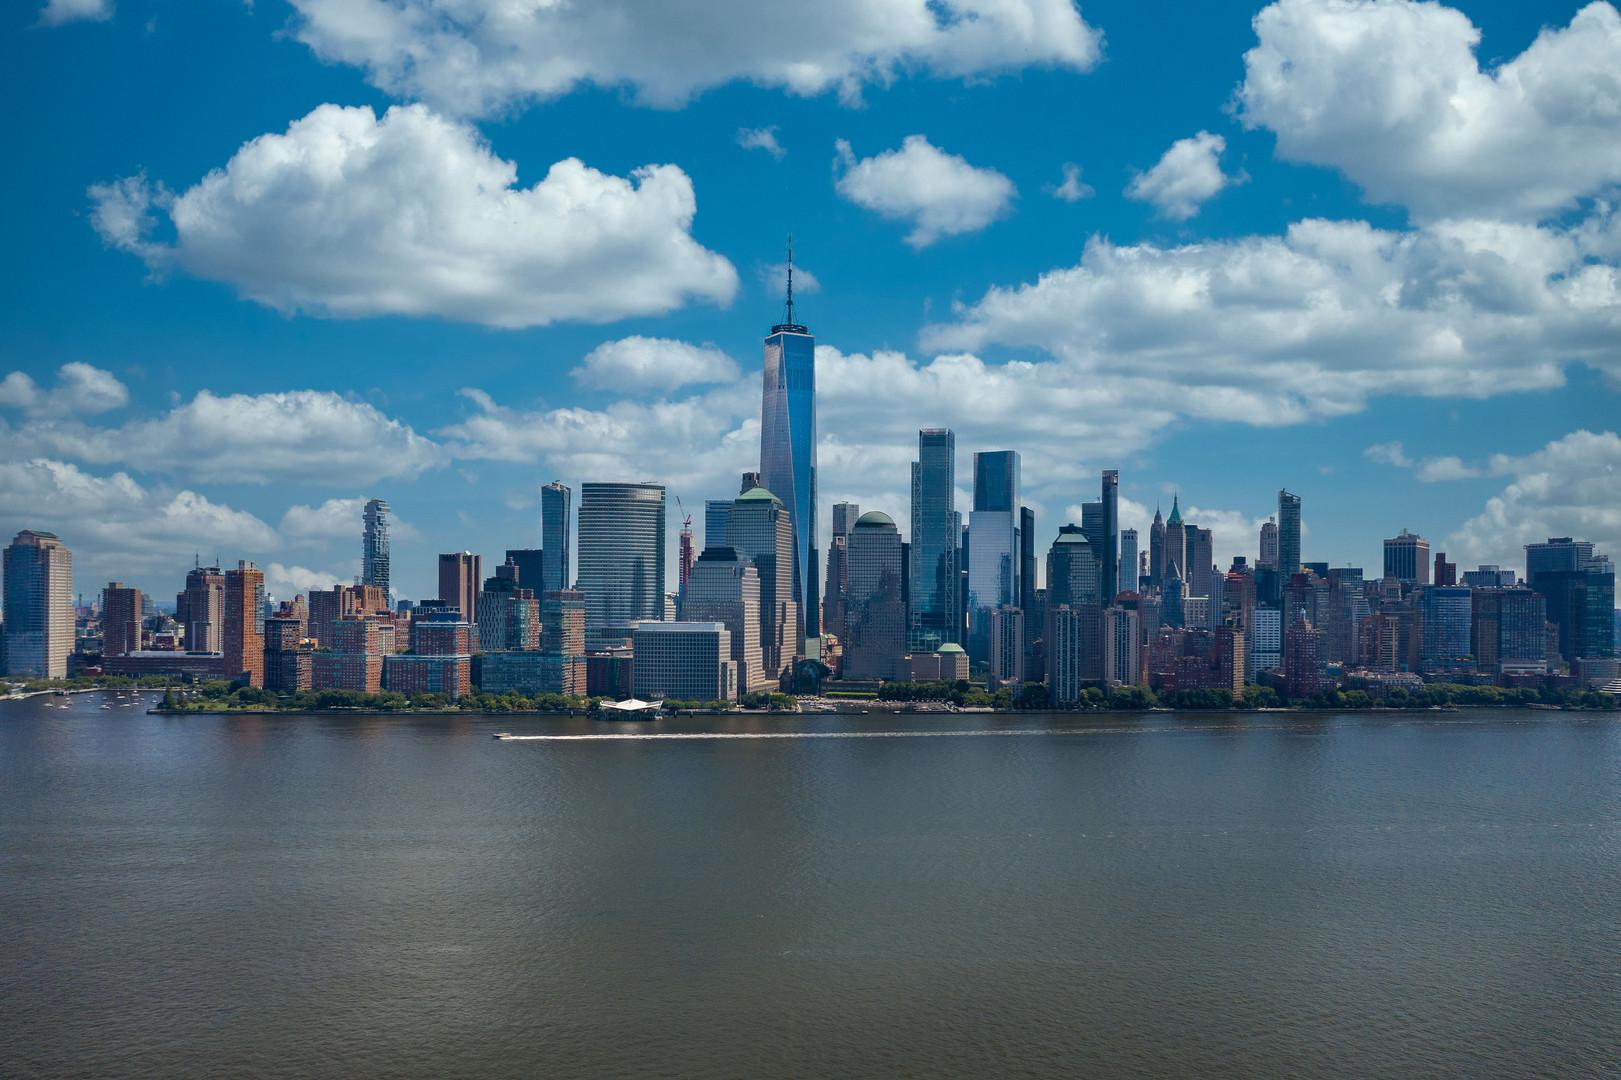 NYC_Skyline-1.jpg